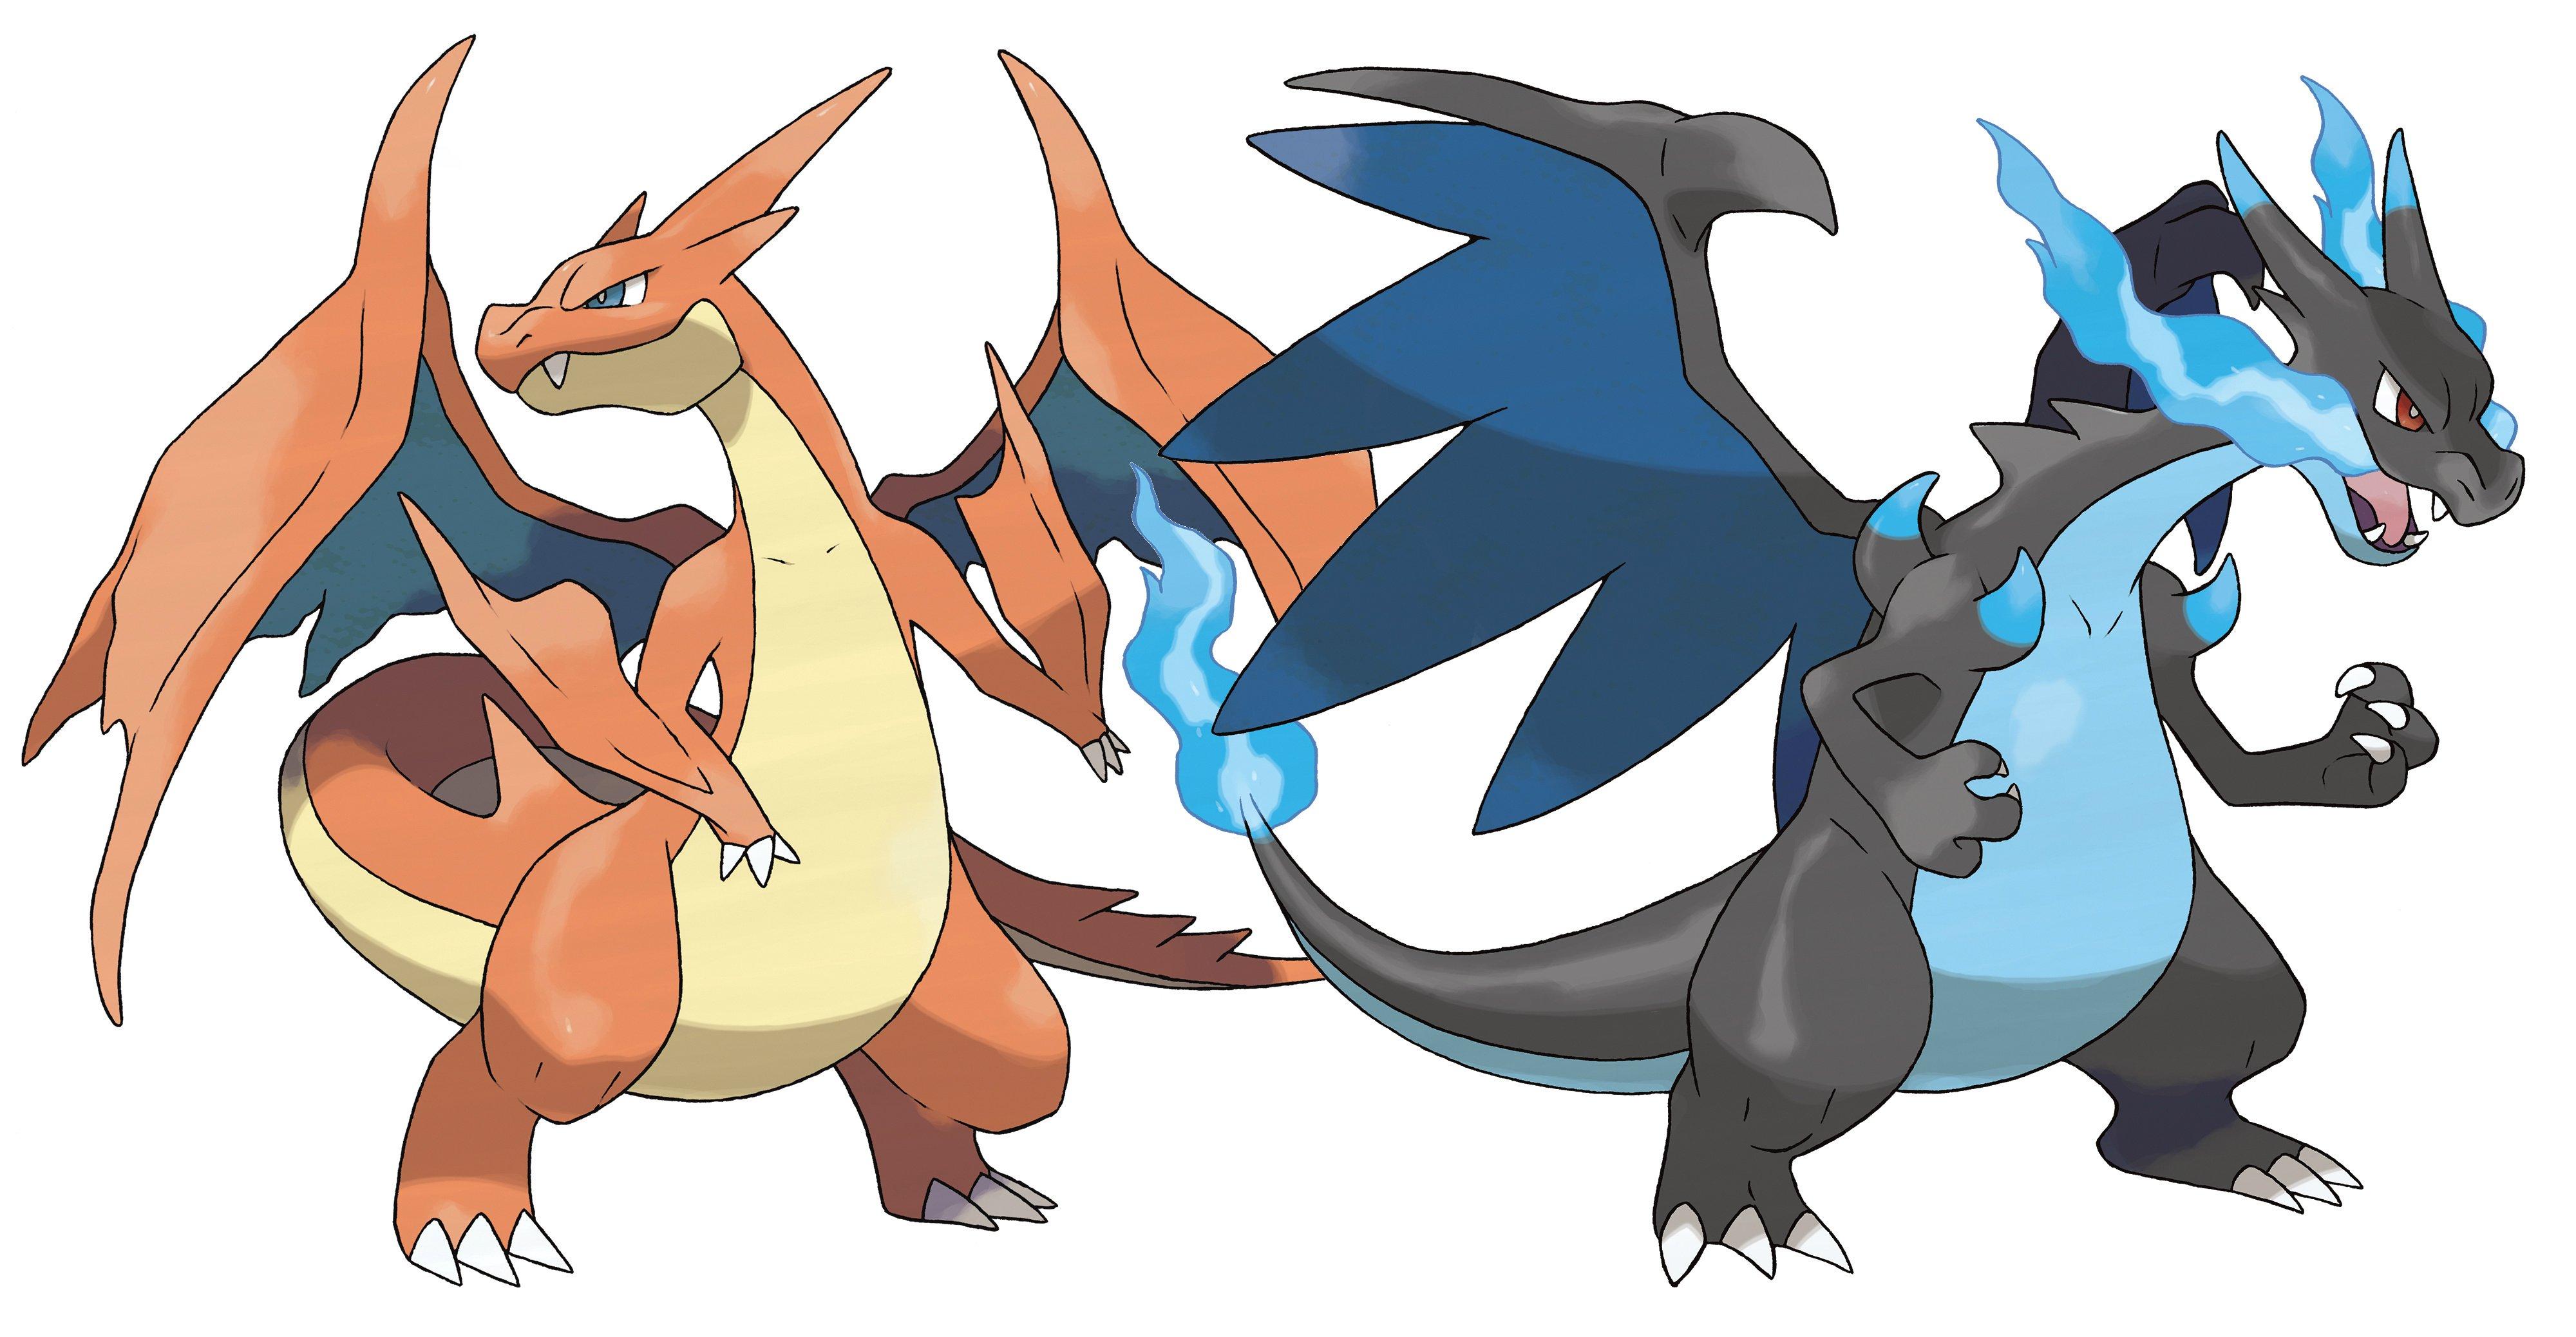 006-Mega Charizard X by Tzblacktd on DeviantArt |Pokemon X And Y Mega Evolutions Charizard